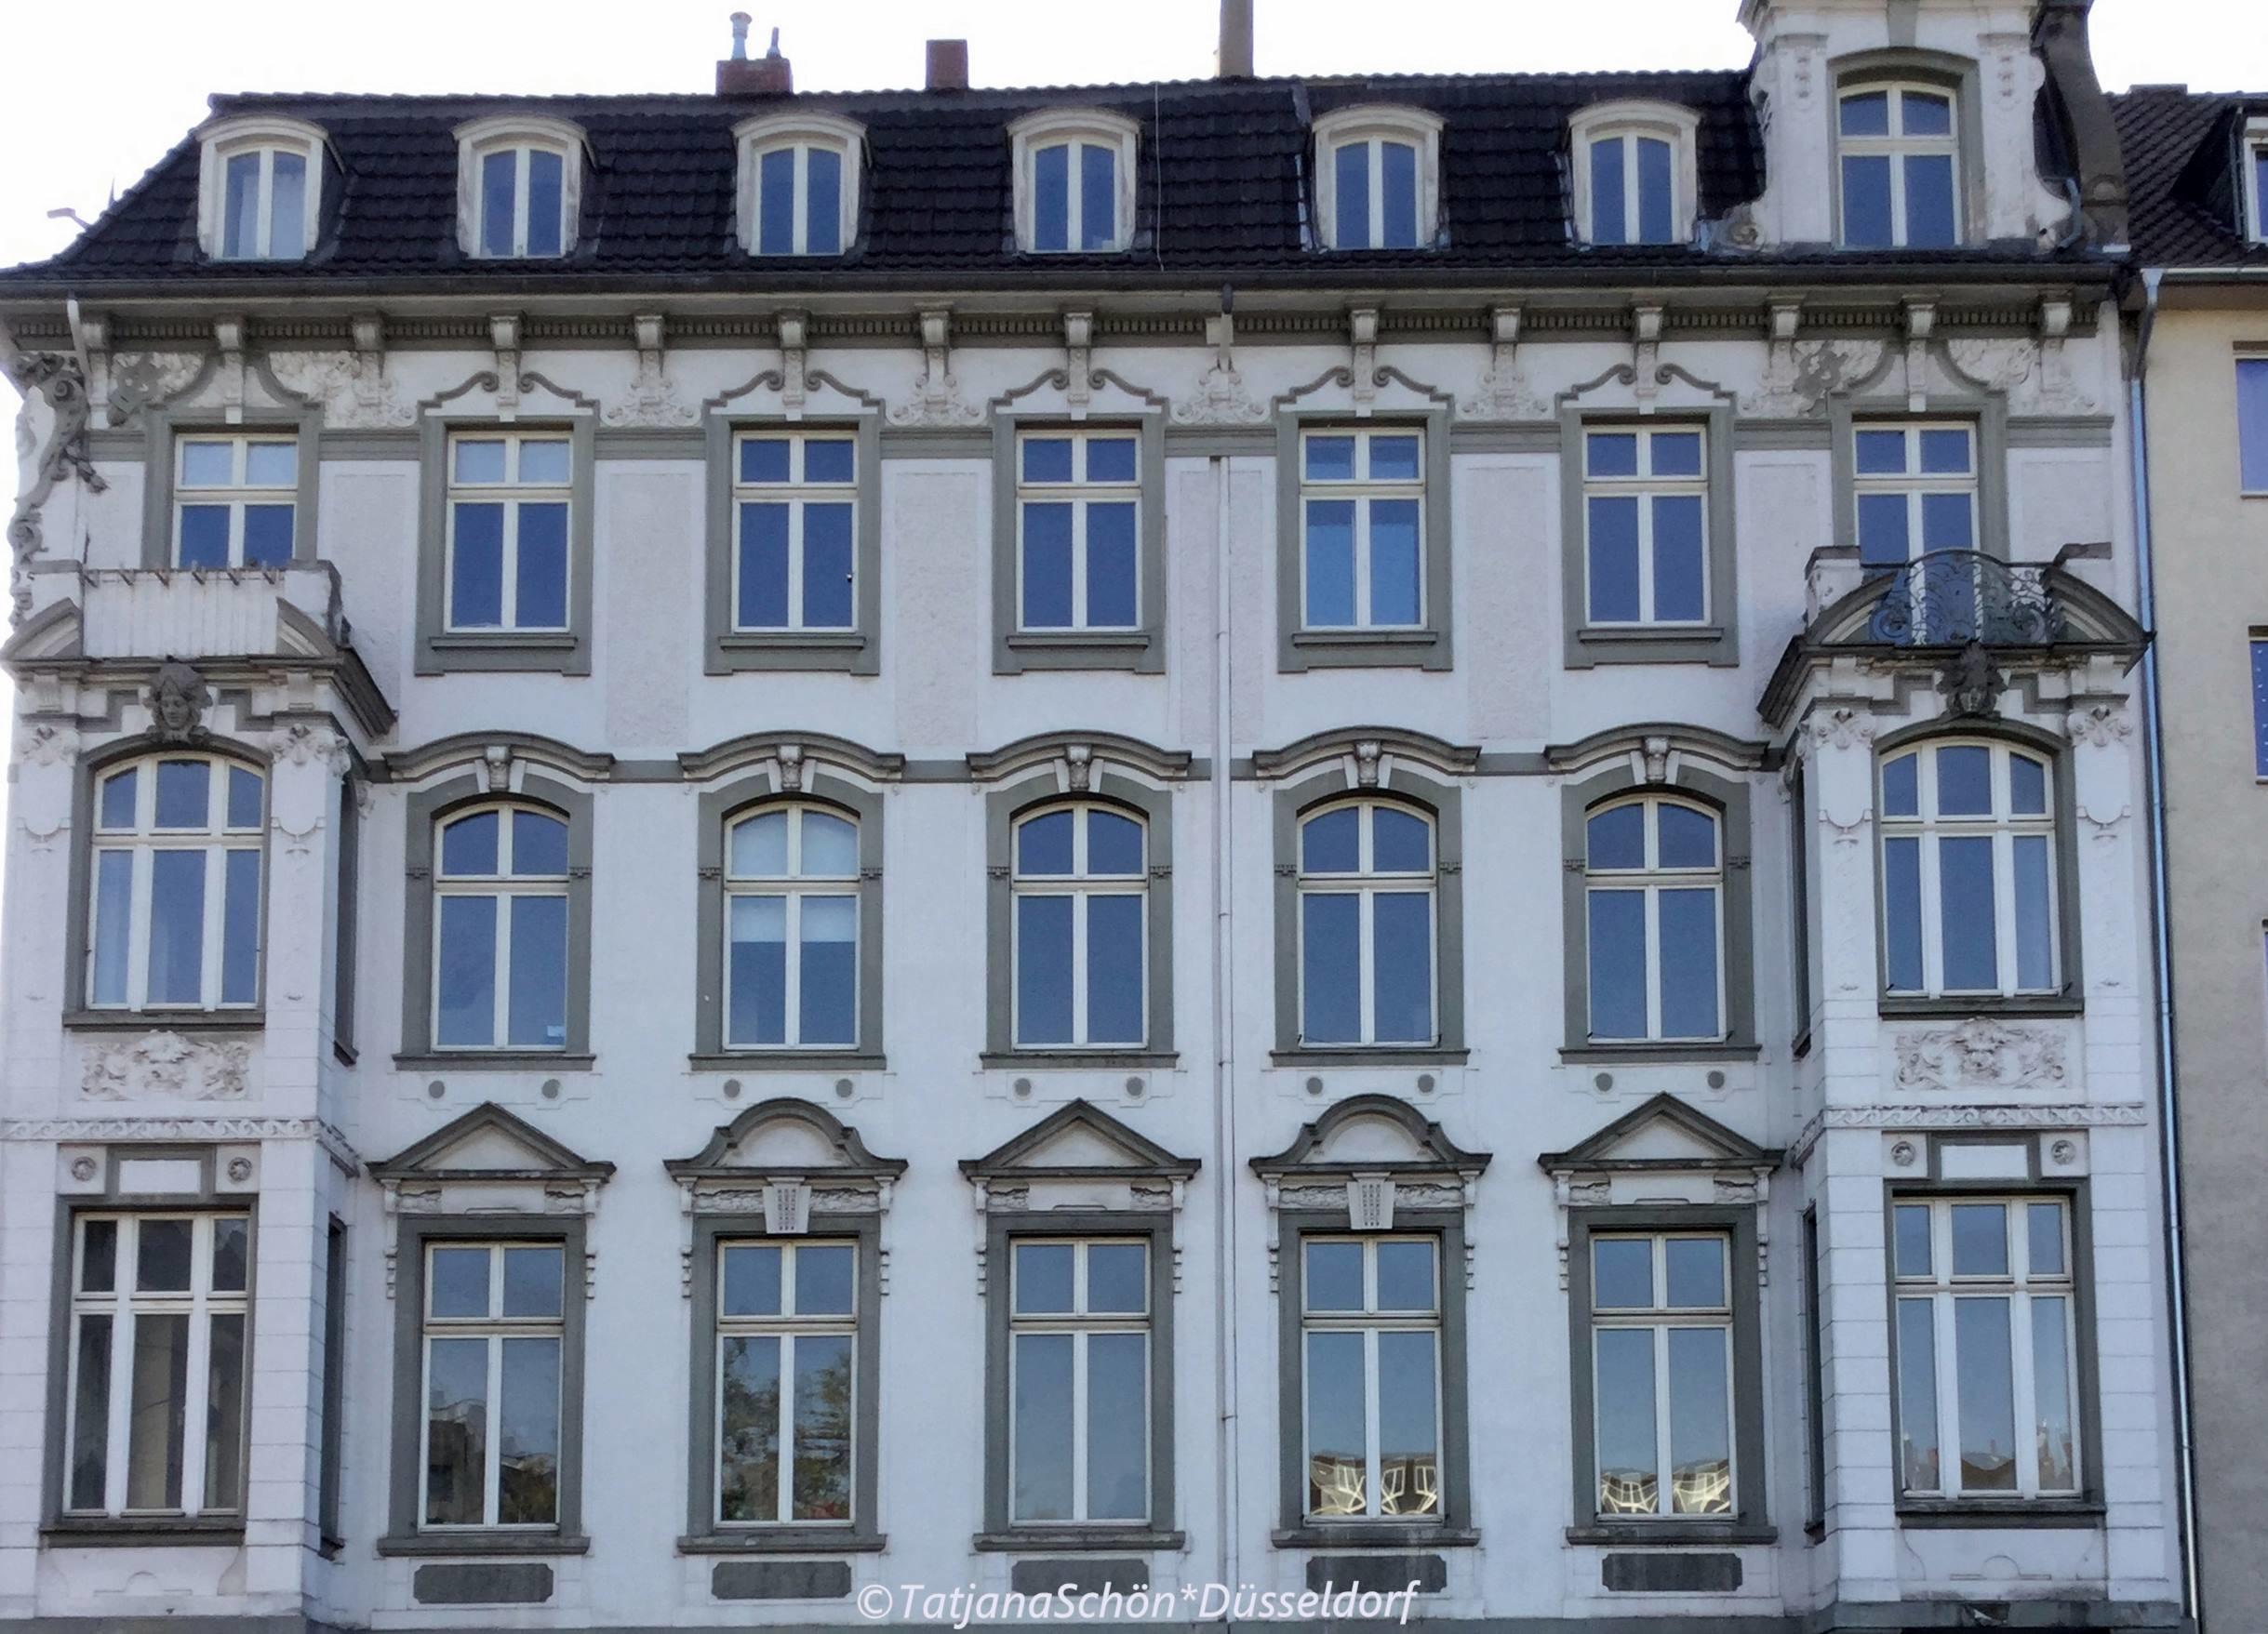 В том же Карлштадте («Городе Карла в Деревне на Дюссели») - конец 19 века.